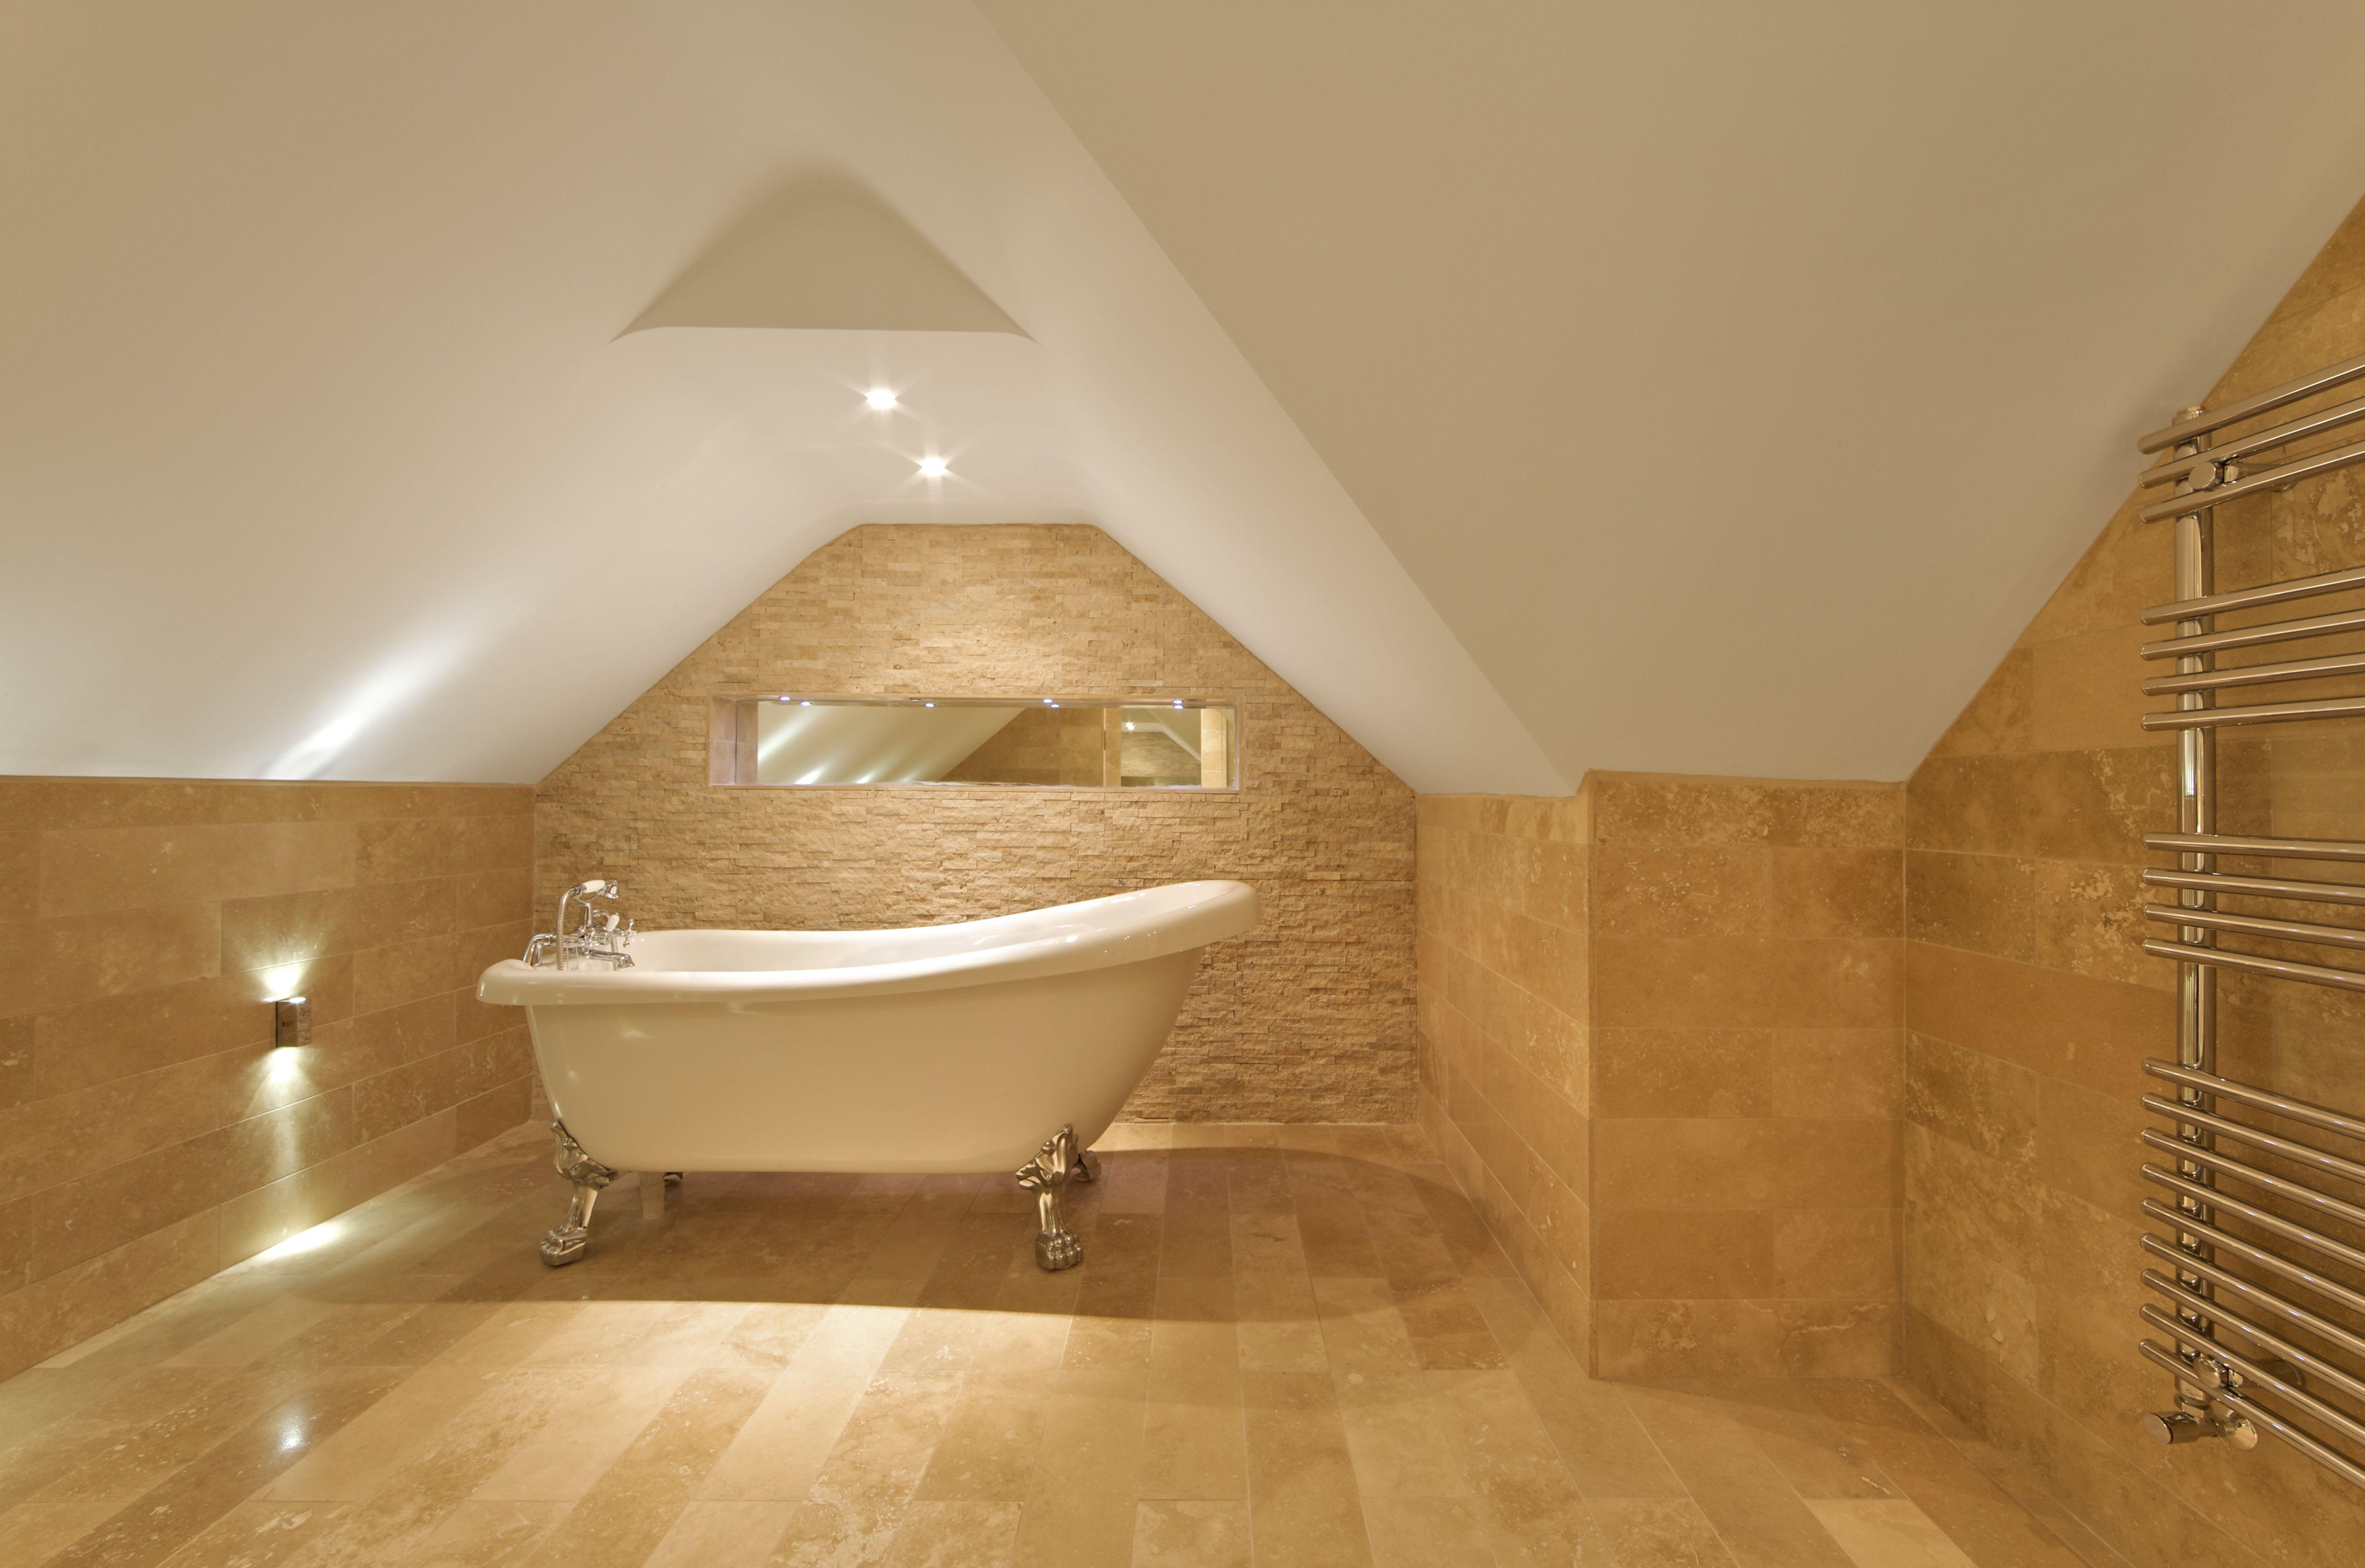 An elegant Roman bath tub in attic bathroom, marble tiles on floor and walls, modern towel rail